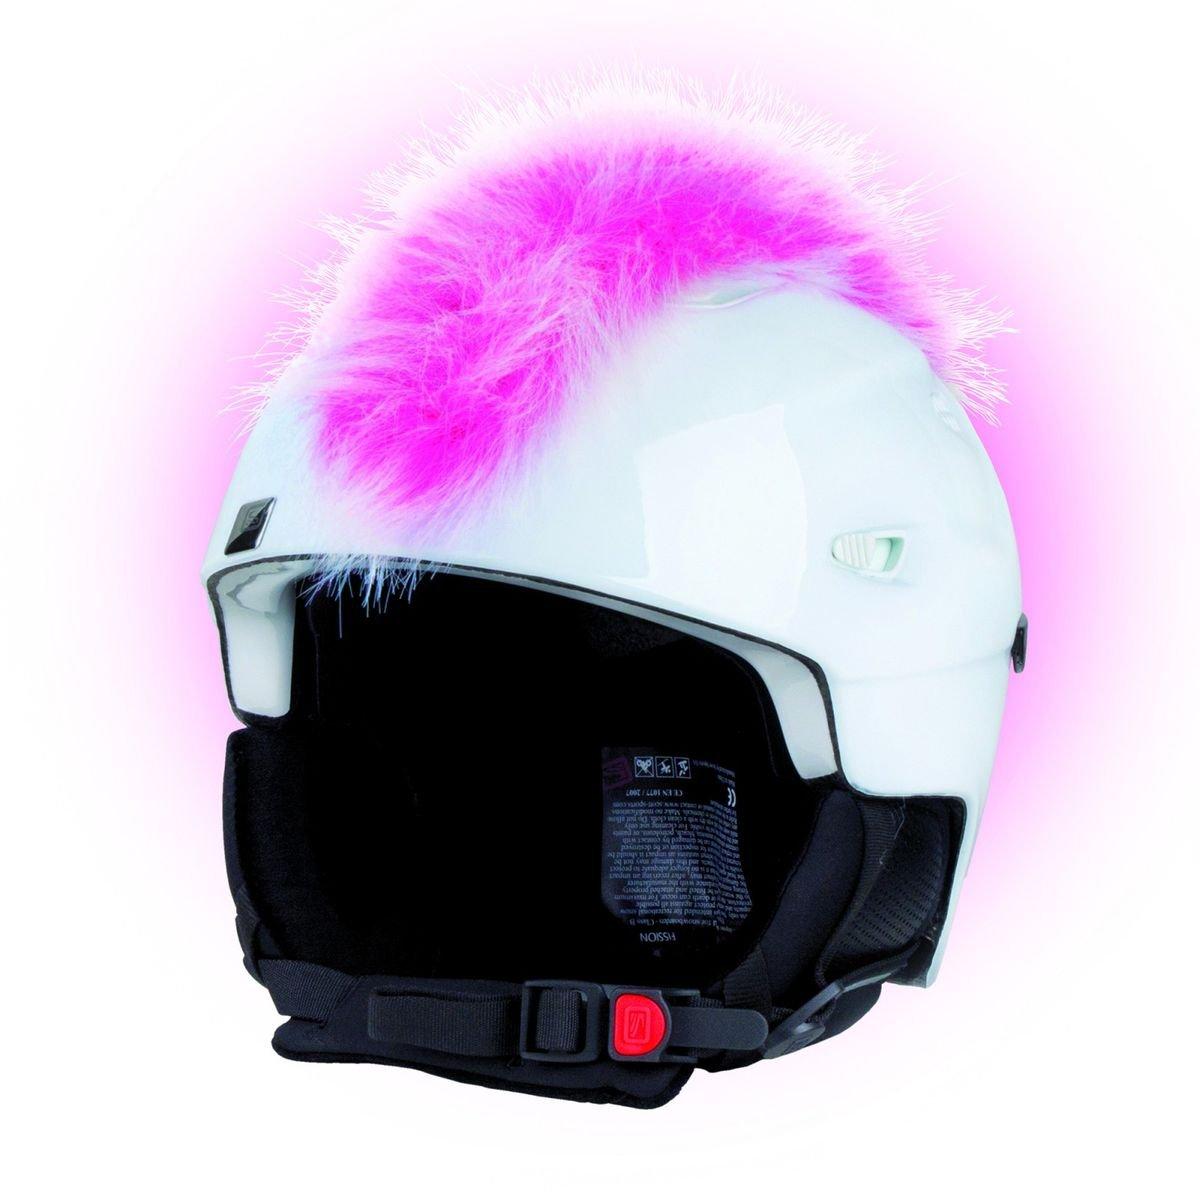 Crazy Ears Helm-Accessoires Irokese Mohawk Schwarz Weiß Pink Ski Snowboard